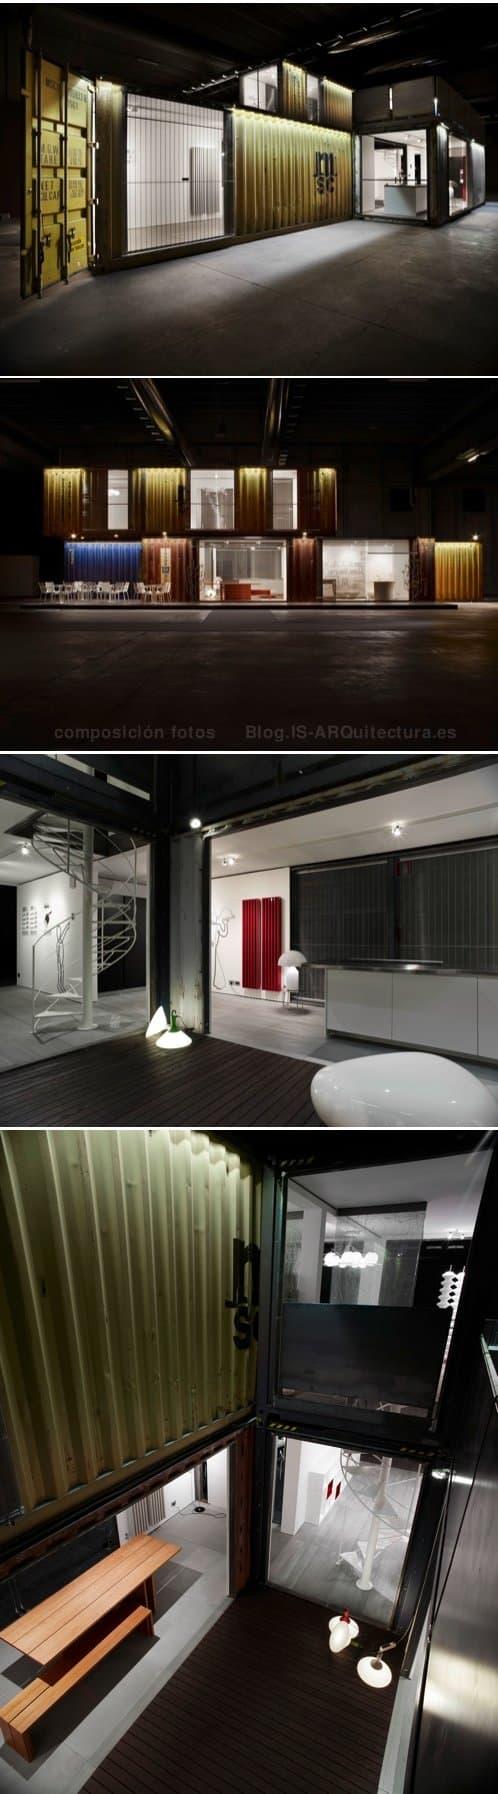 green-frame-house-casa-contenedores